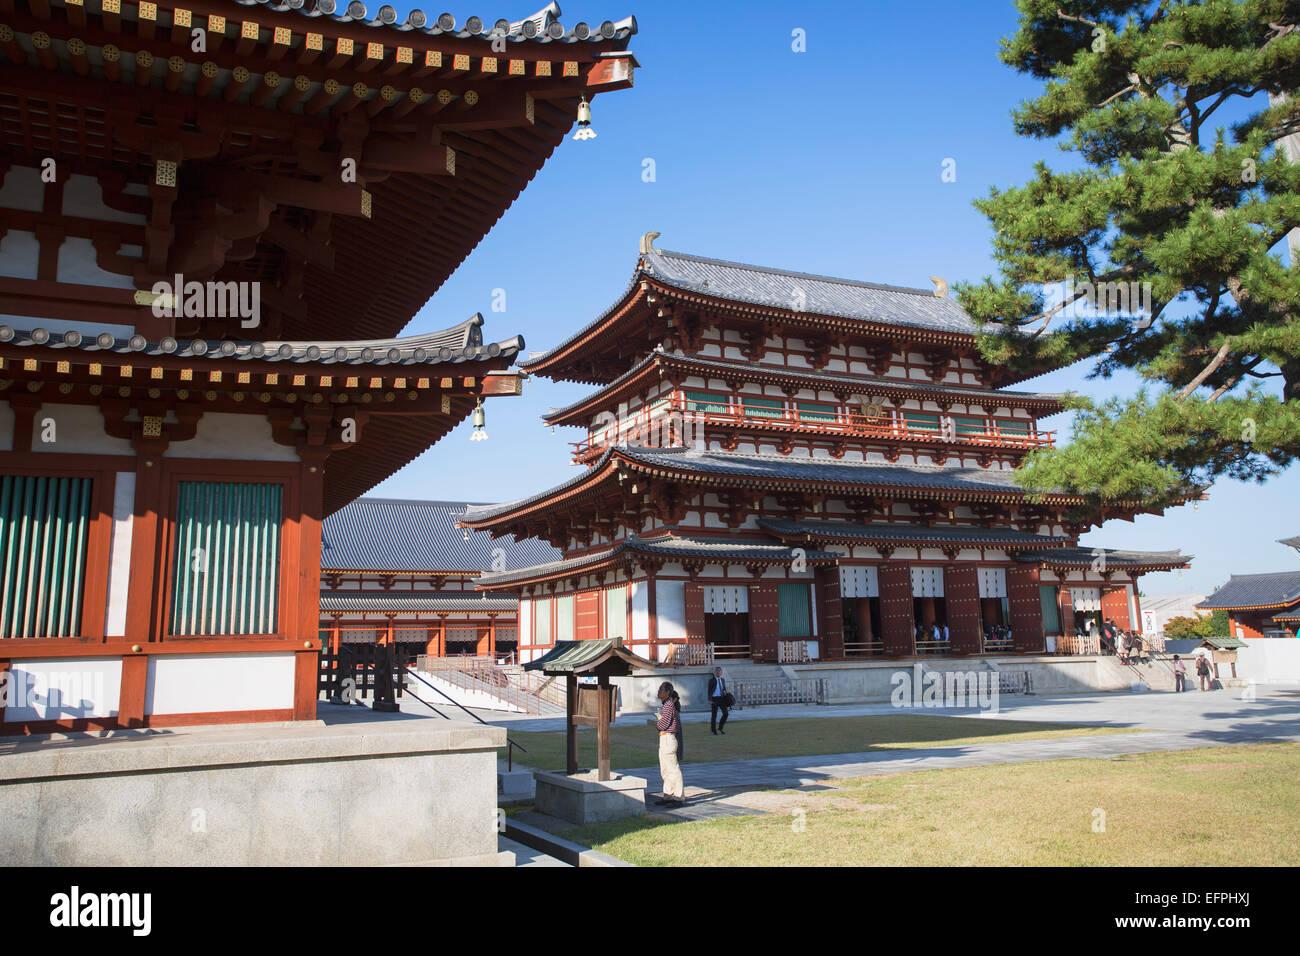 Main Hall at Yakushiji Temple, UNESCO World Heritage Site, Nara, Kansai, Japan, Asia - Stock Image